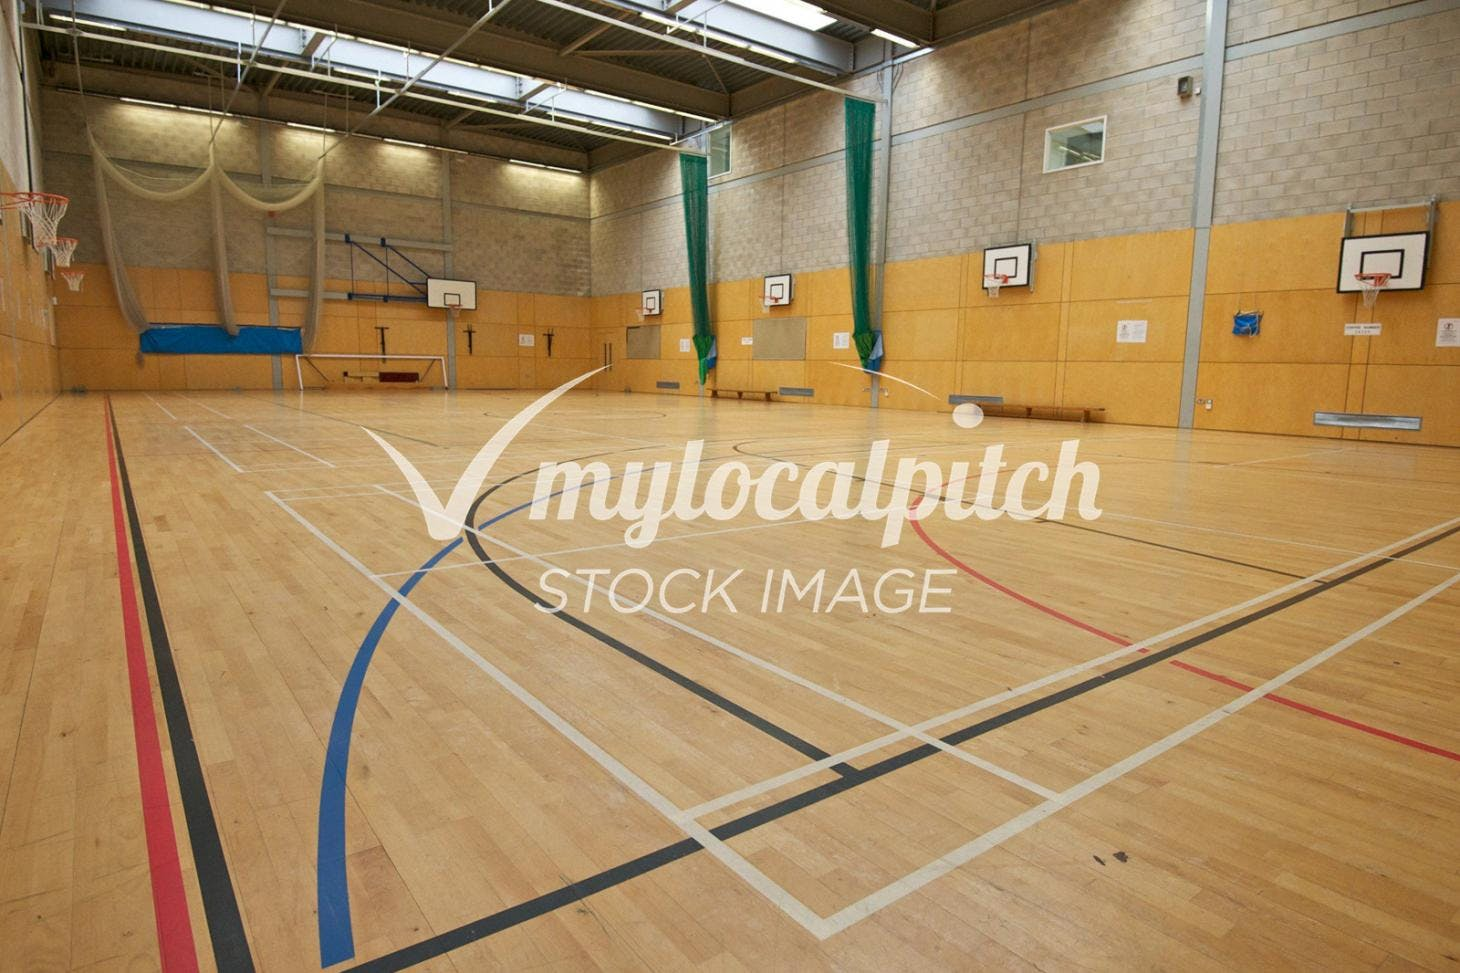 dlr Loughlinstown Indoor basketball court